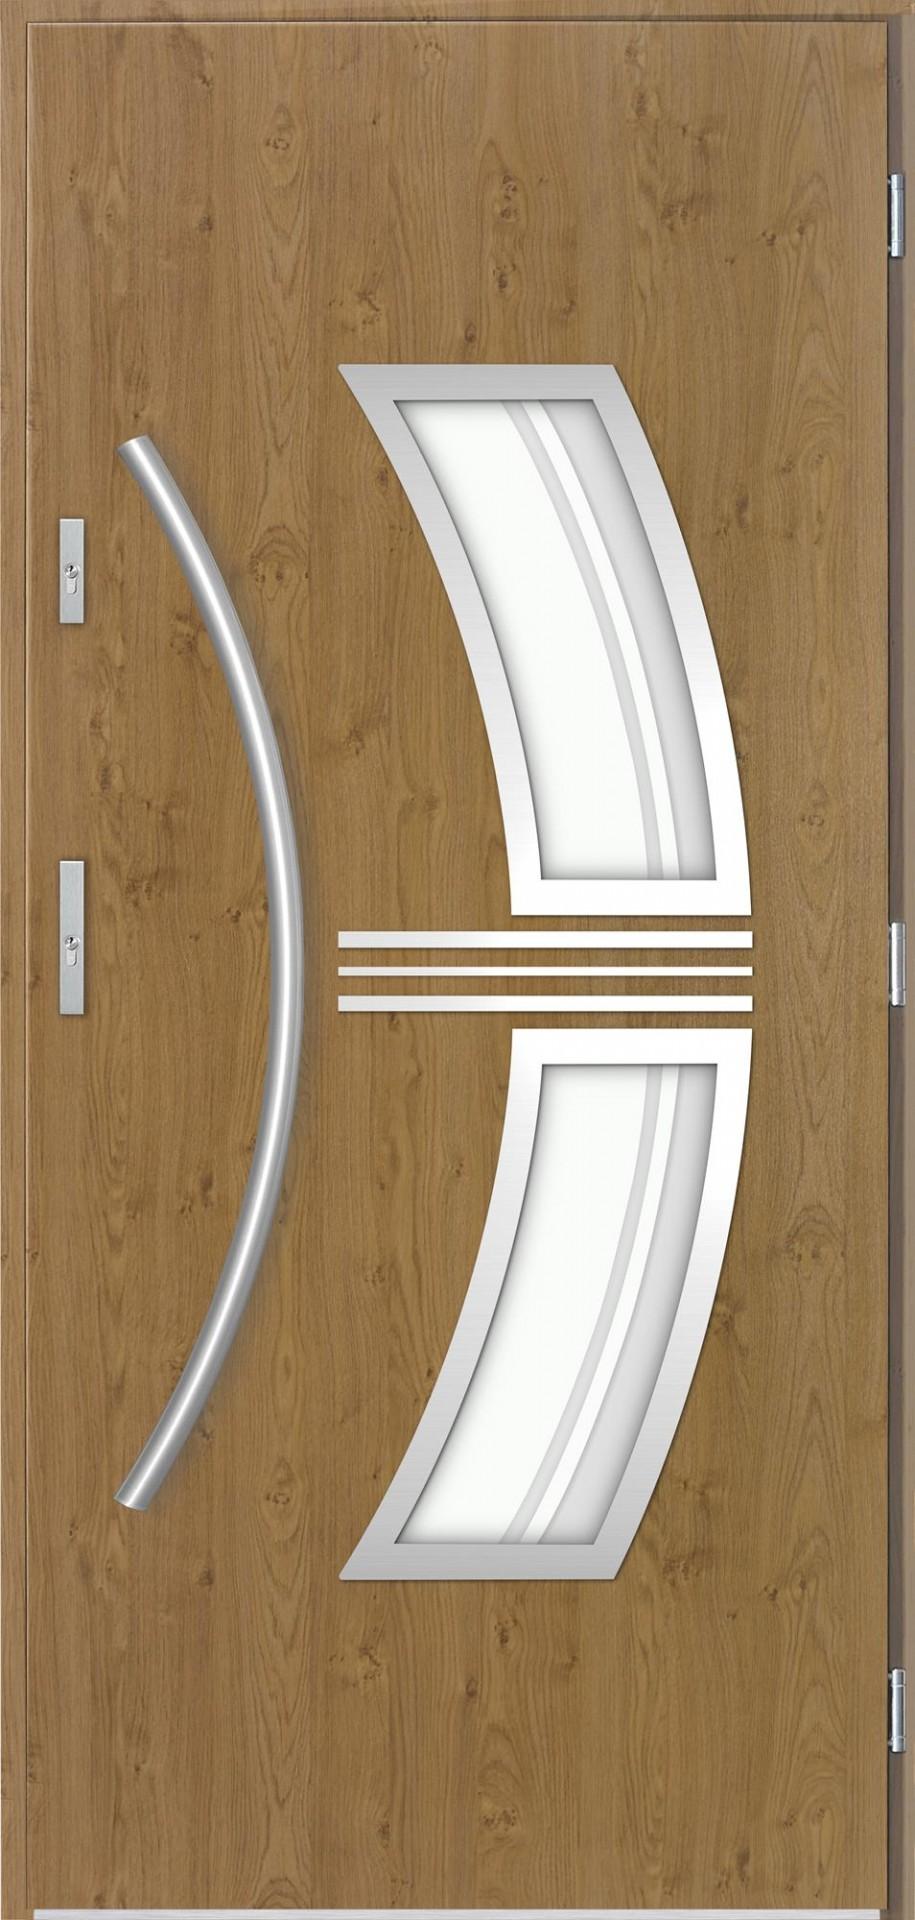 Polstar Sirius, Typ dveří Superior 55